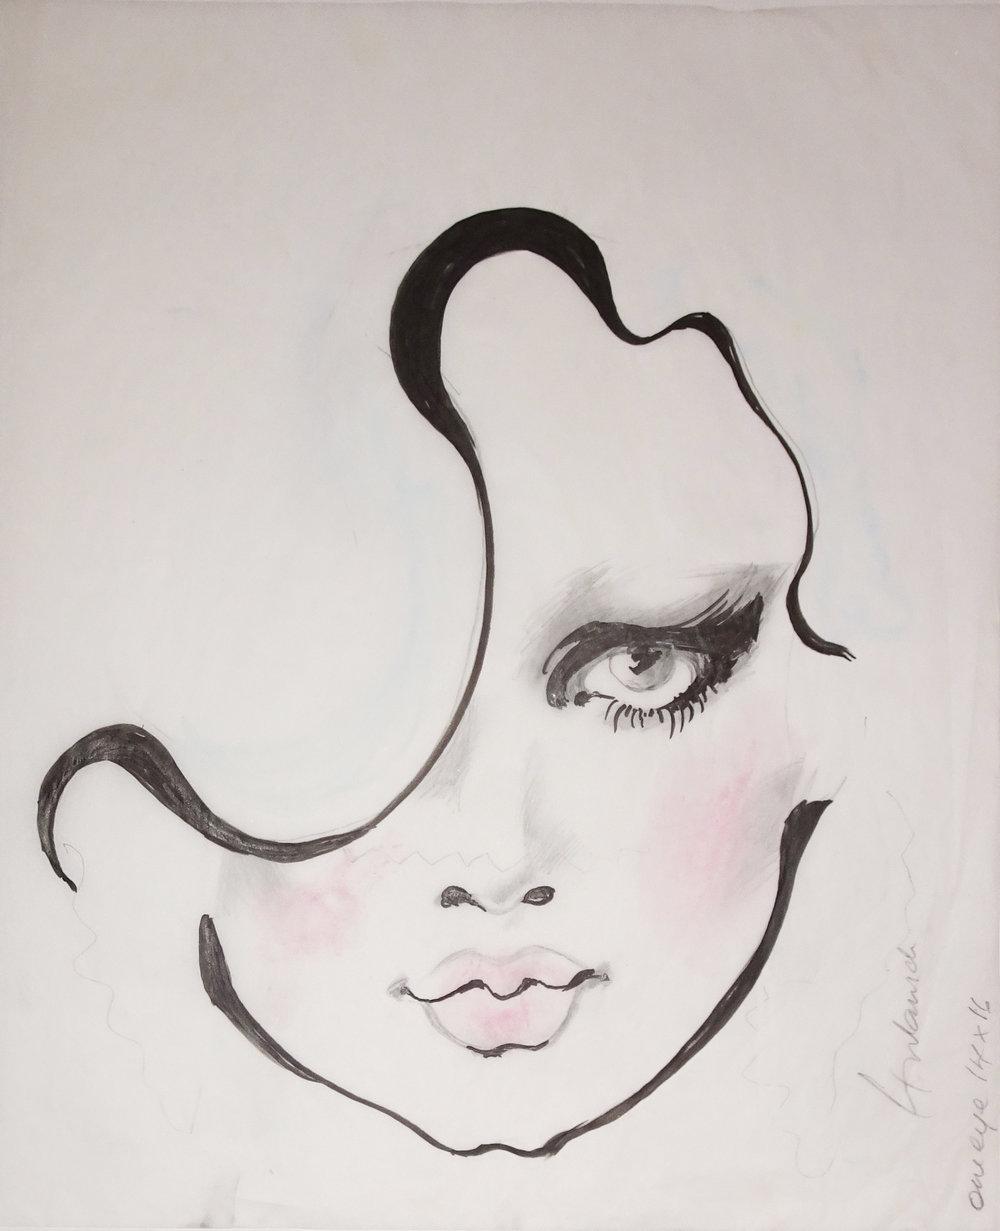 One Eye by Barbara Hulanicki